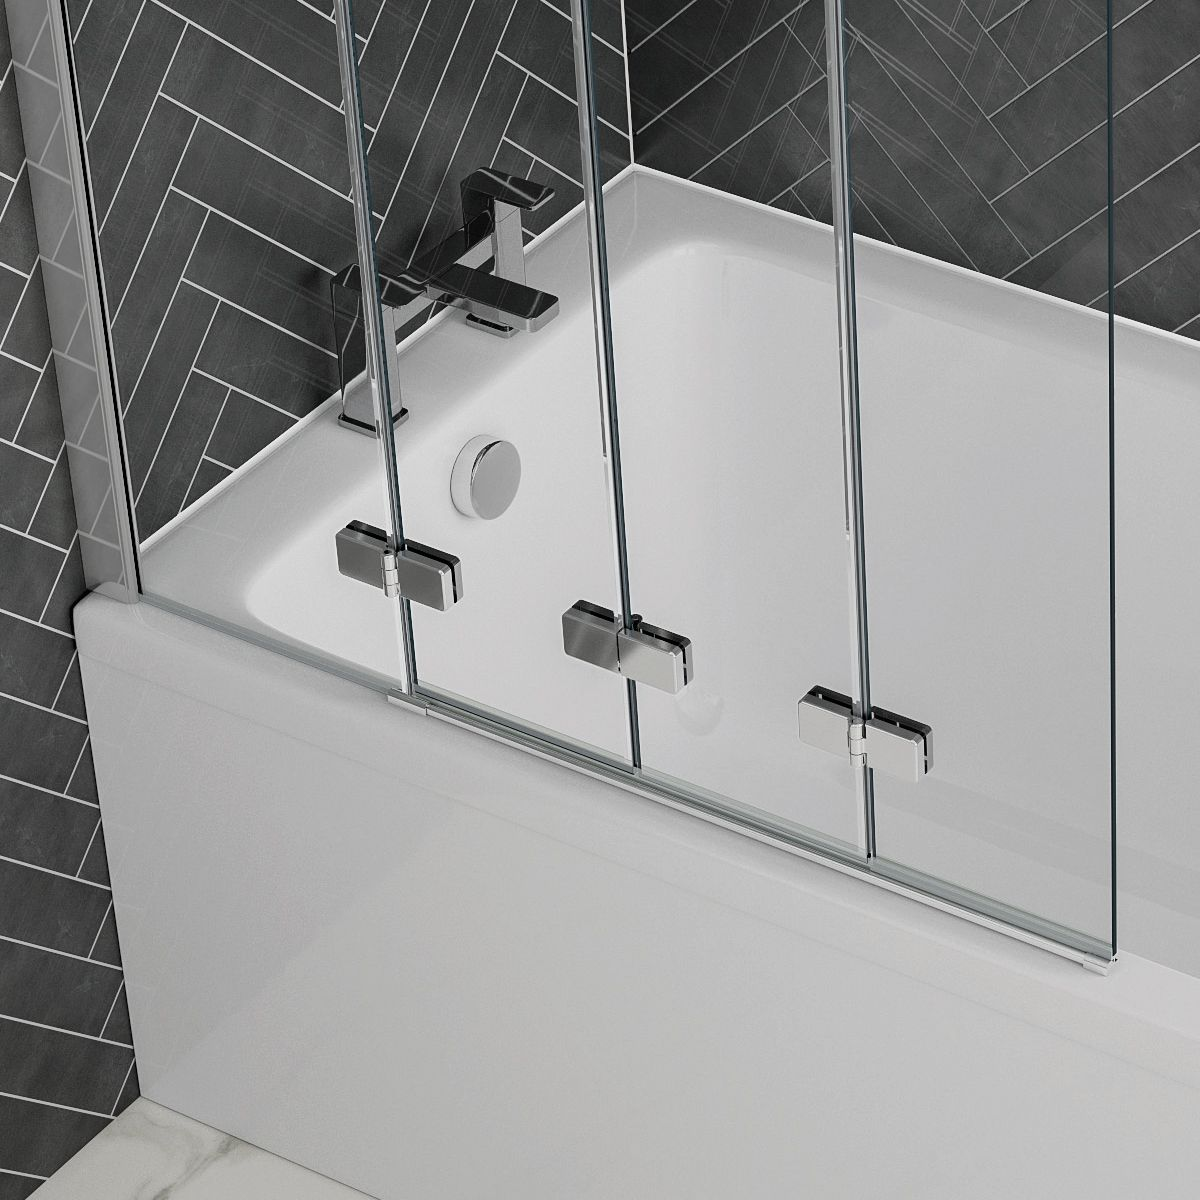 April Prestige Frameless 4 Fold Bath Screen Hinges